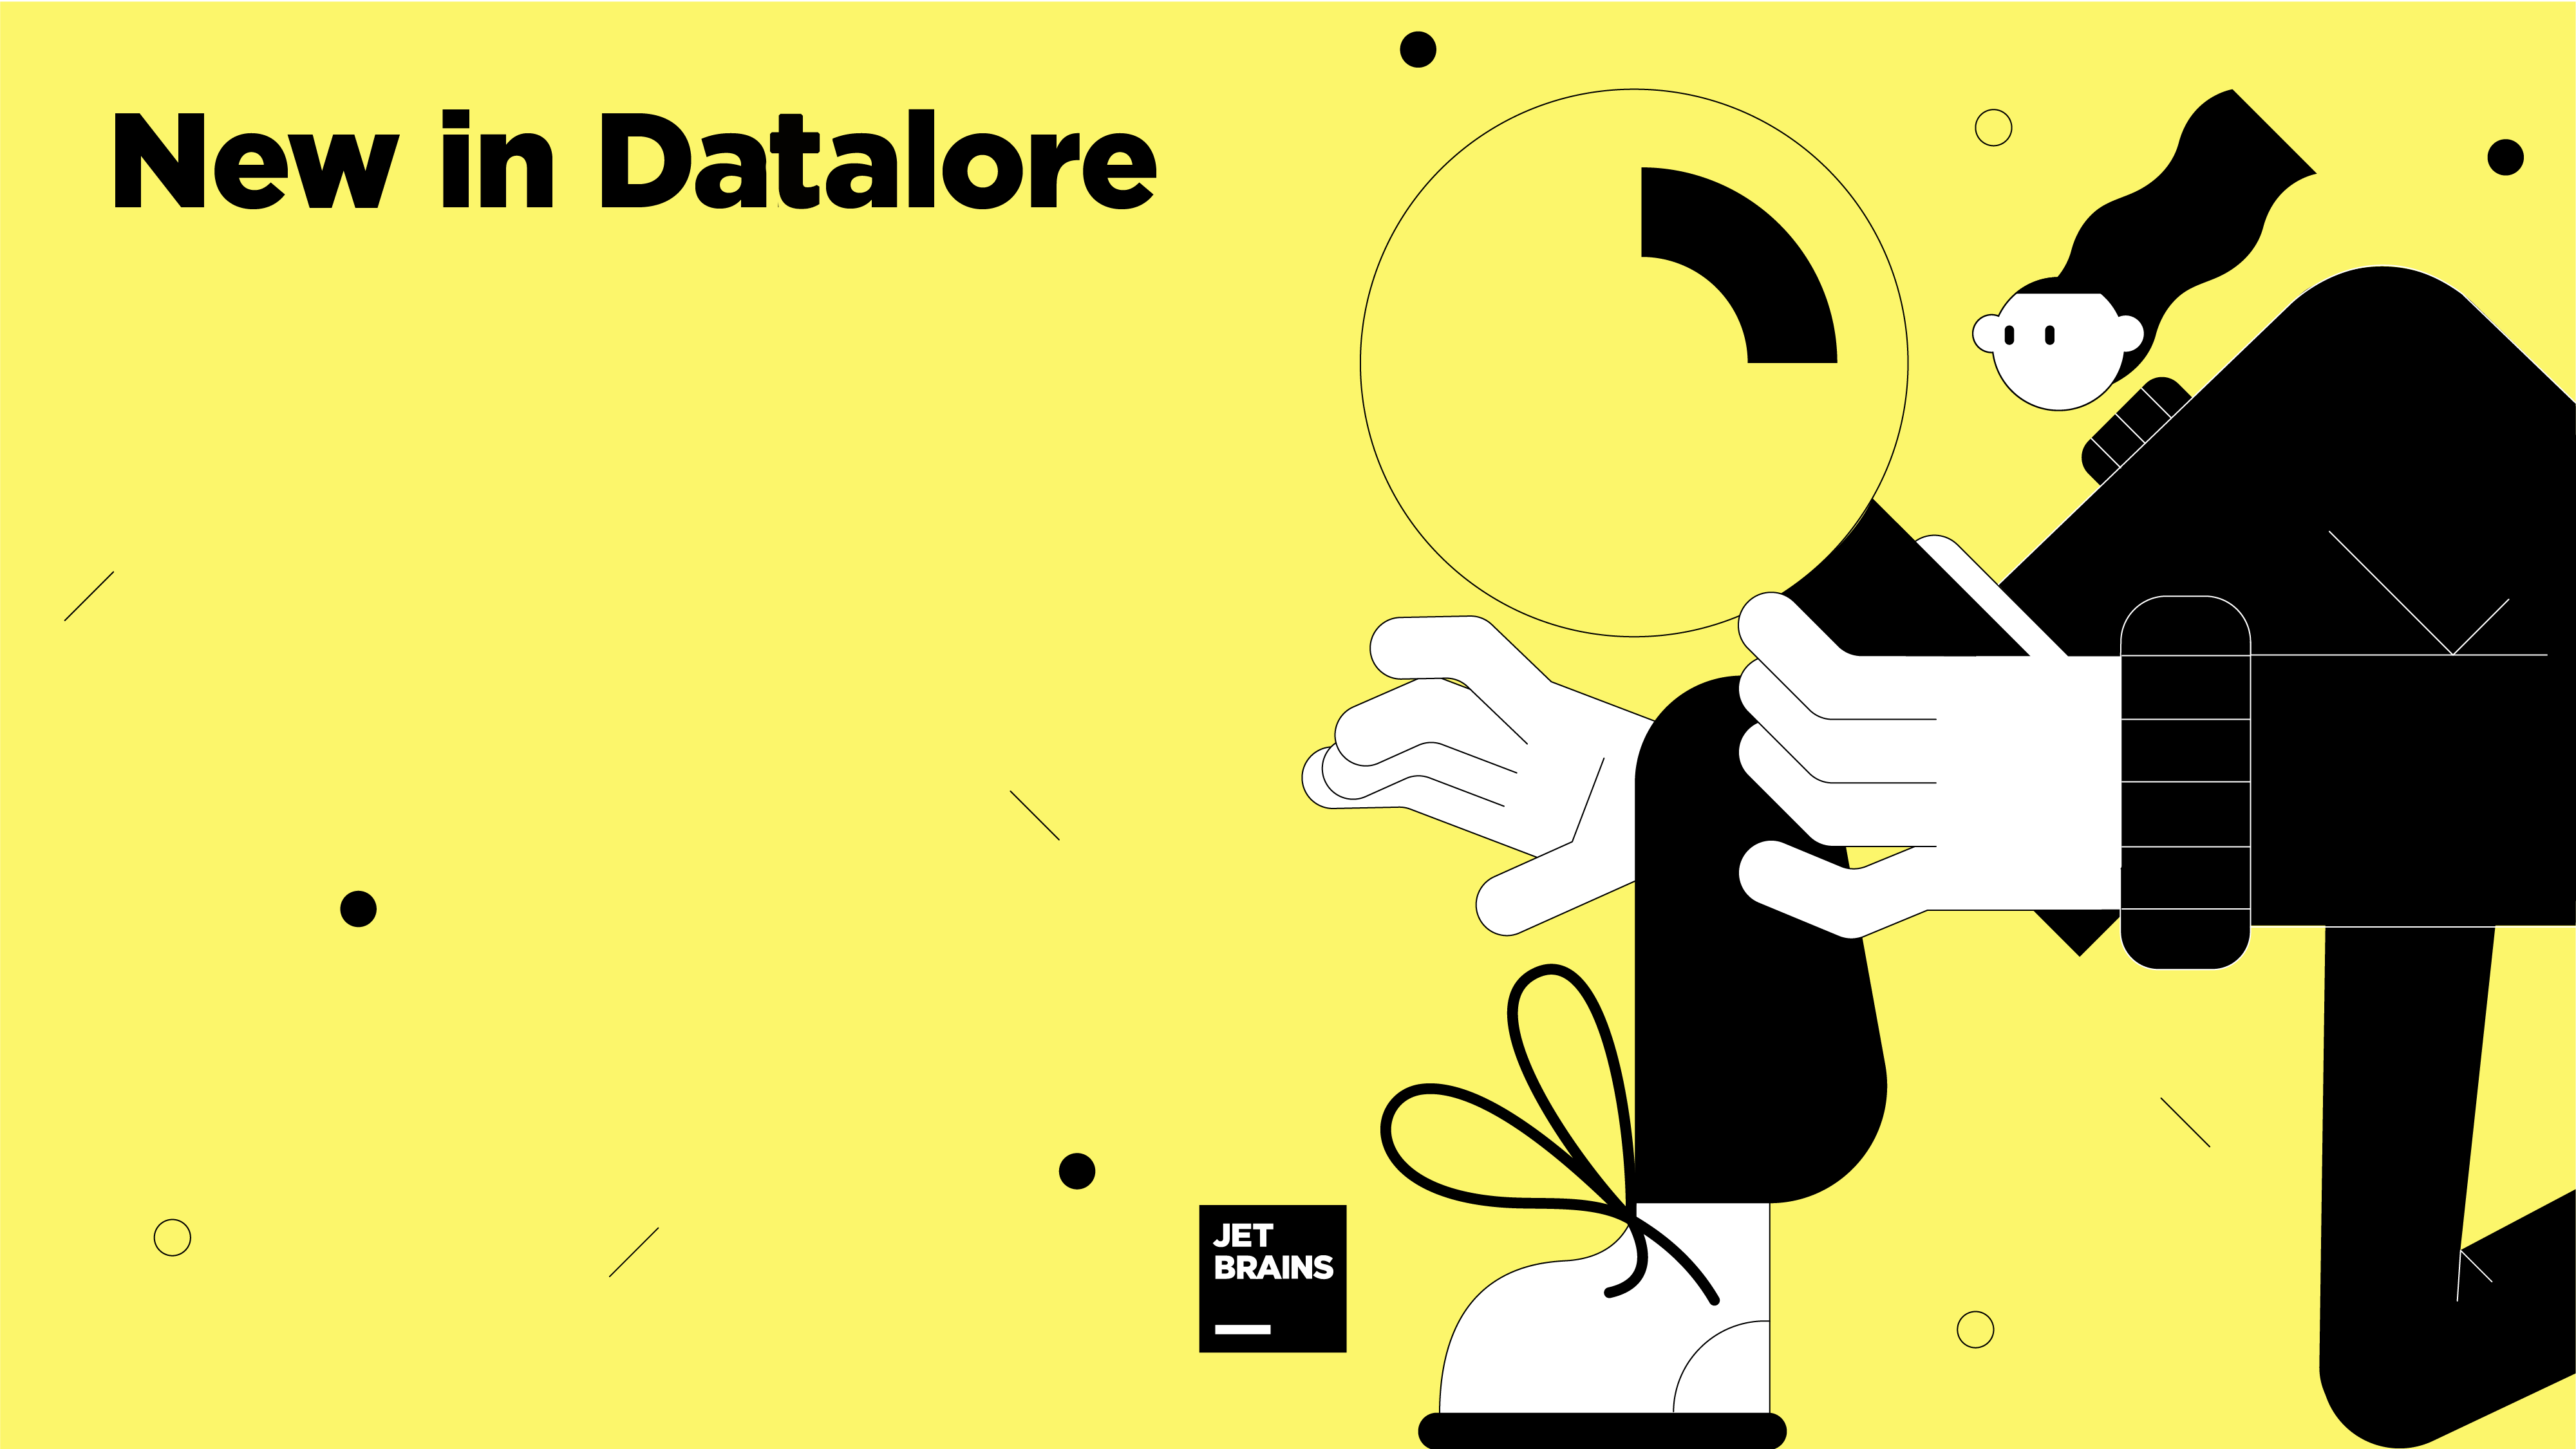 New in Datalore